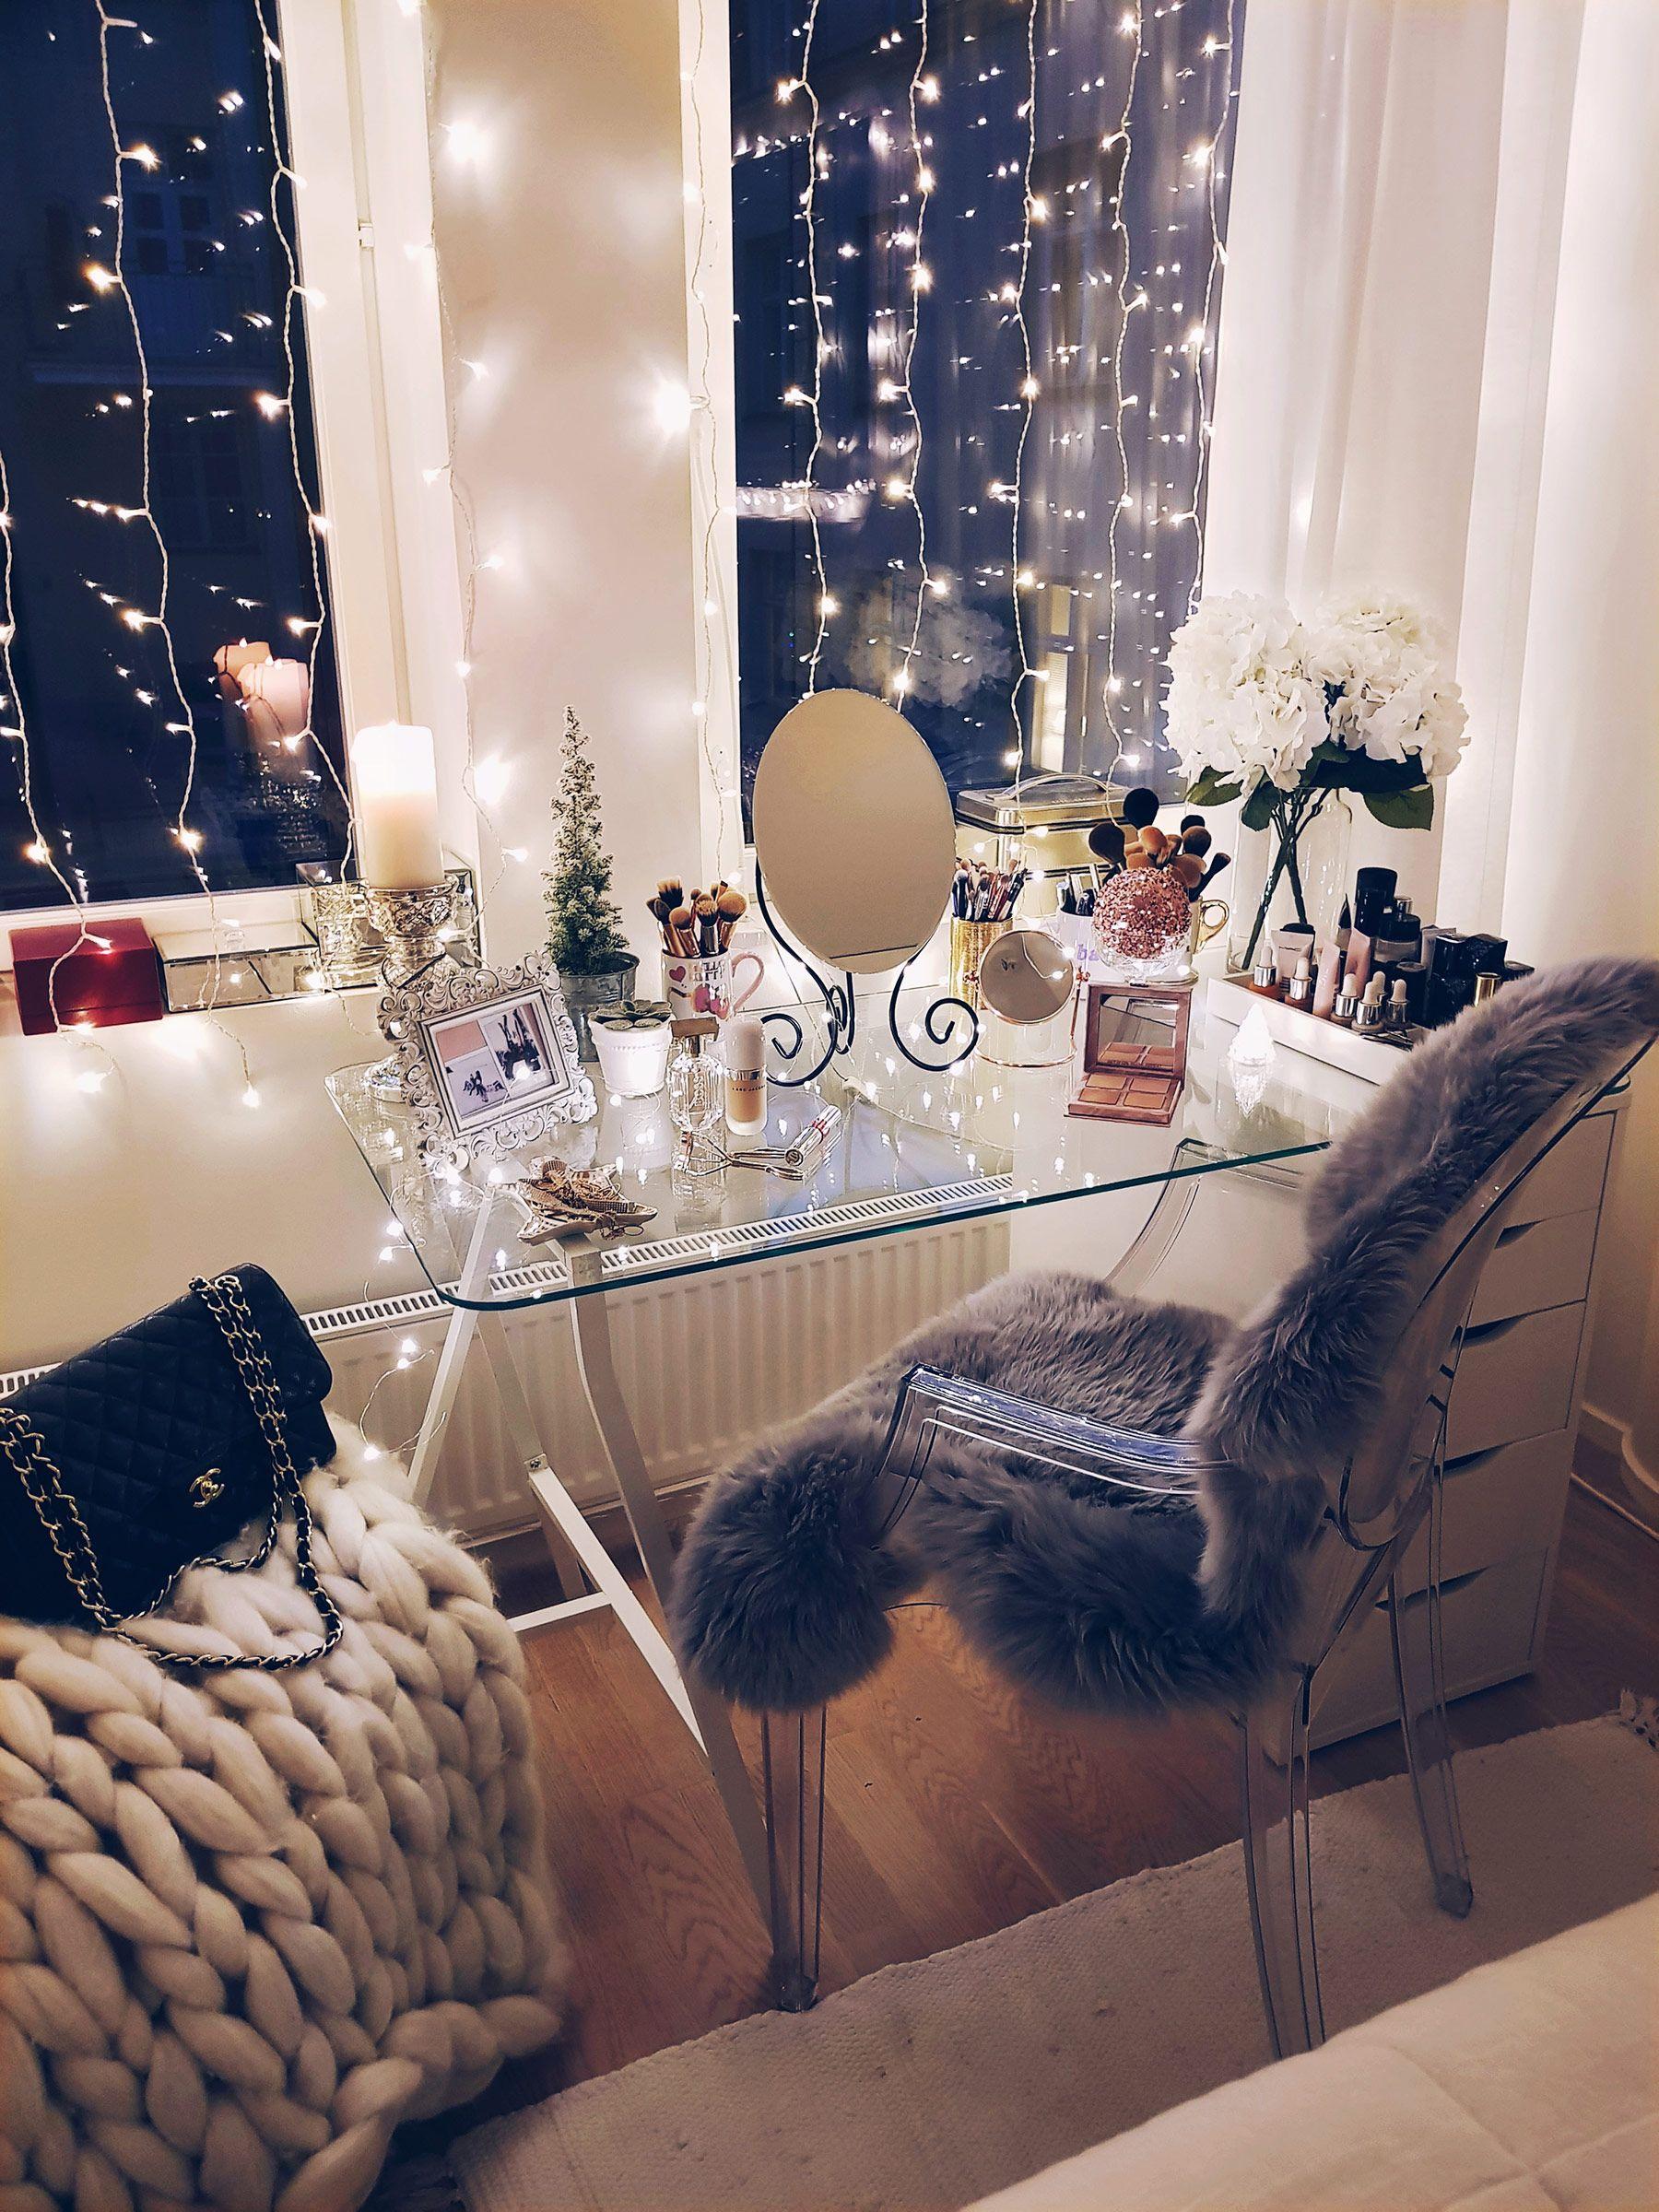 5 x christmassy snaps - Mariannan